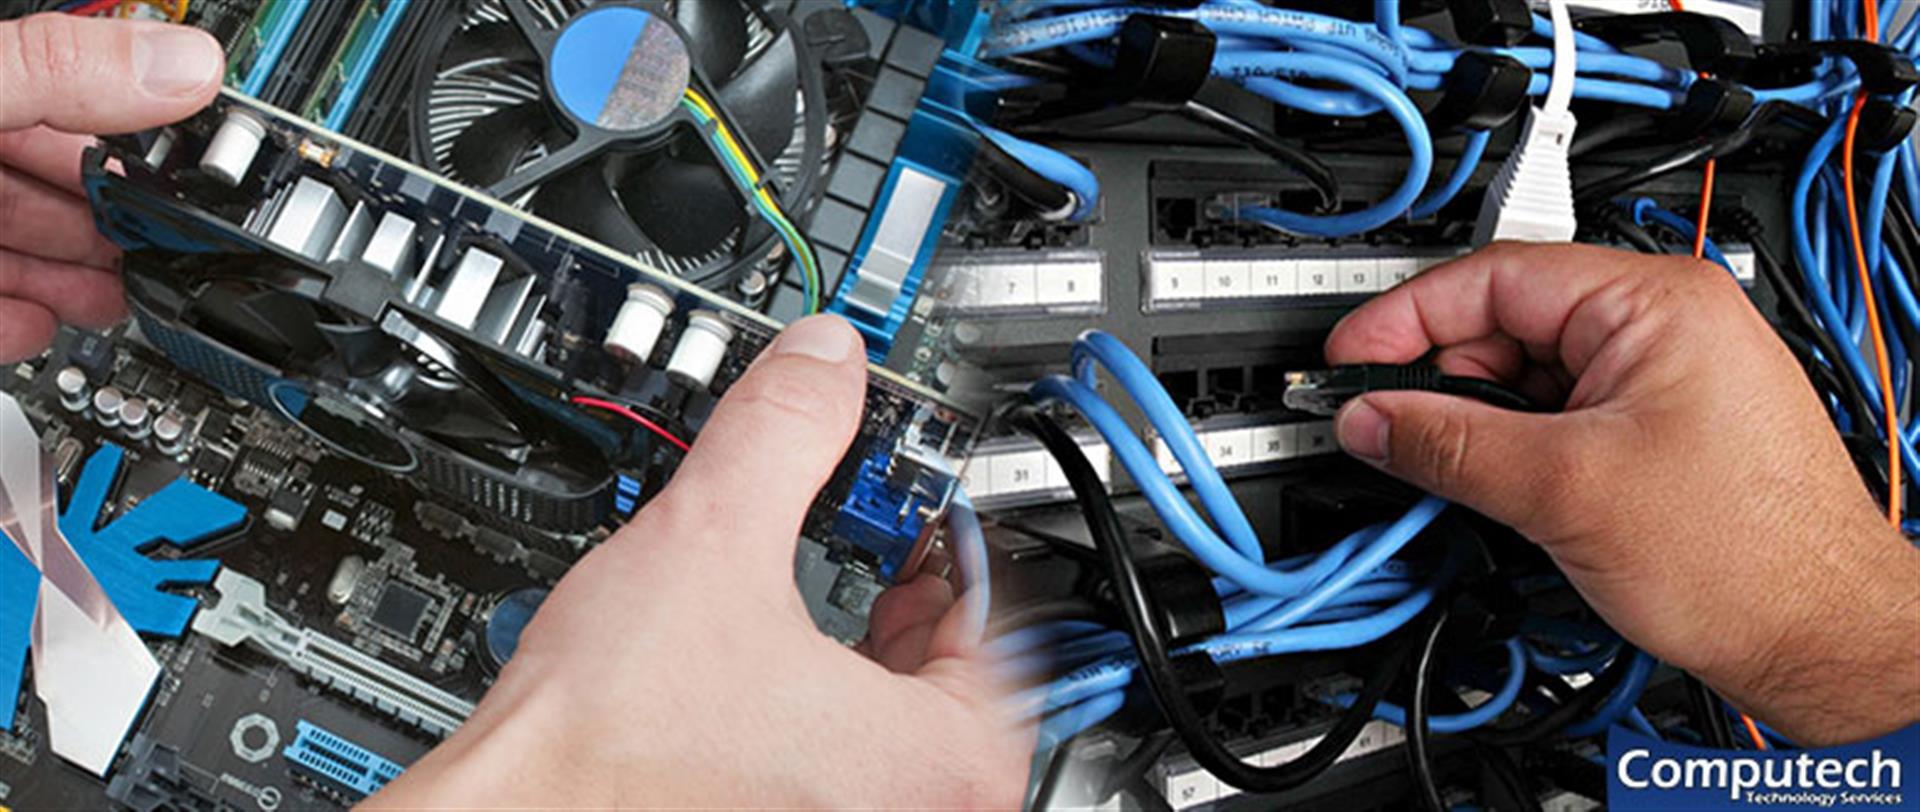 Pell City Alabama Onsite Computer & Printer Repair, Network, Voice & Data Cabling Solutions